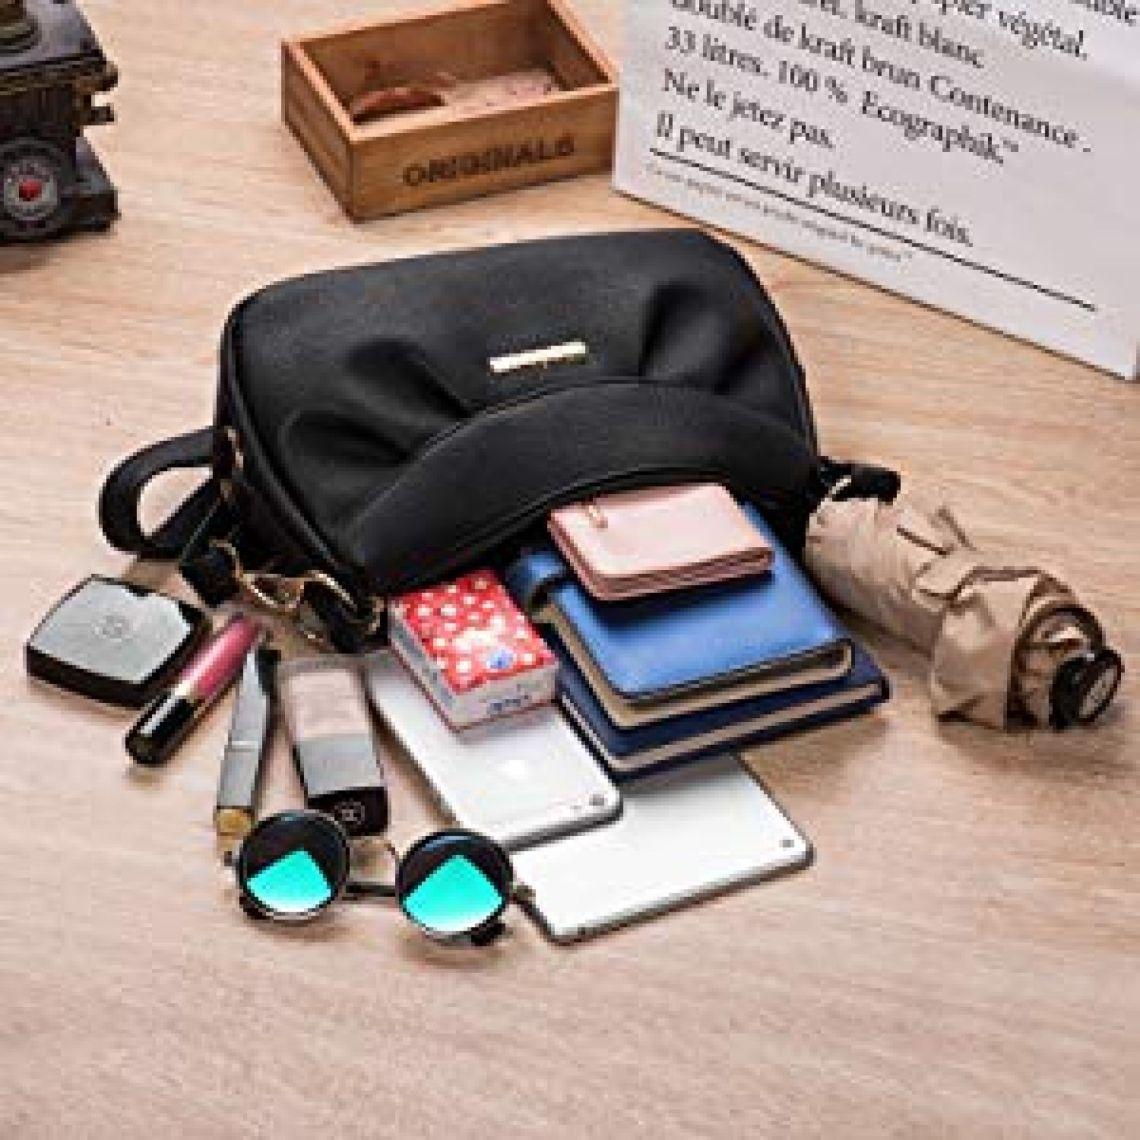 Katloo Crossbody Handbag Small Shoulder Bag for Women Vegan Leather Cross Body Purses Casual Black Nail Clipper: Handbags: Amazon.com